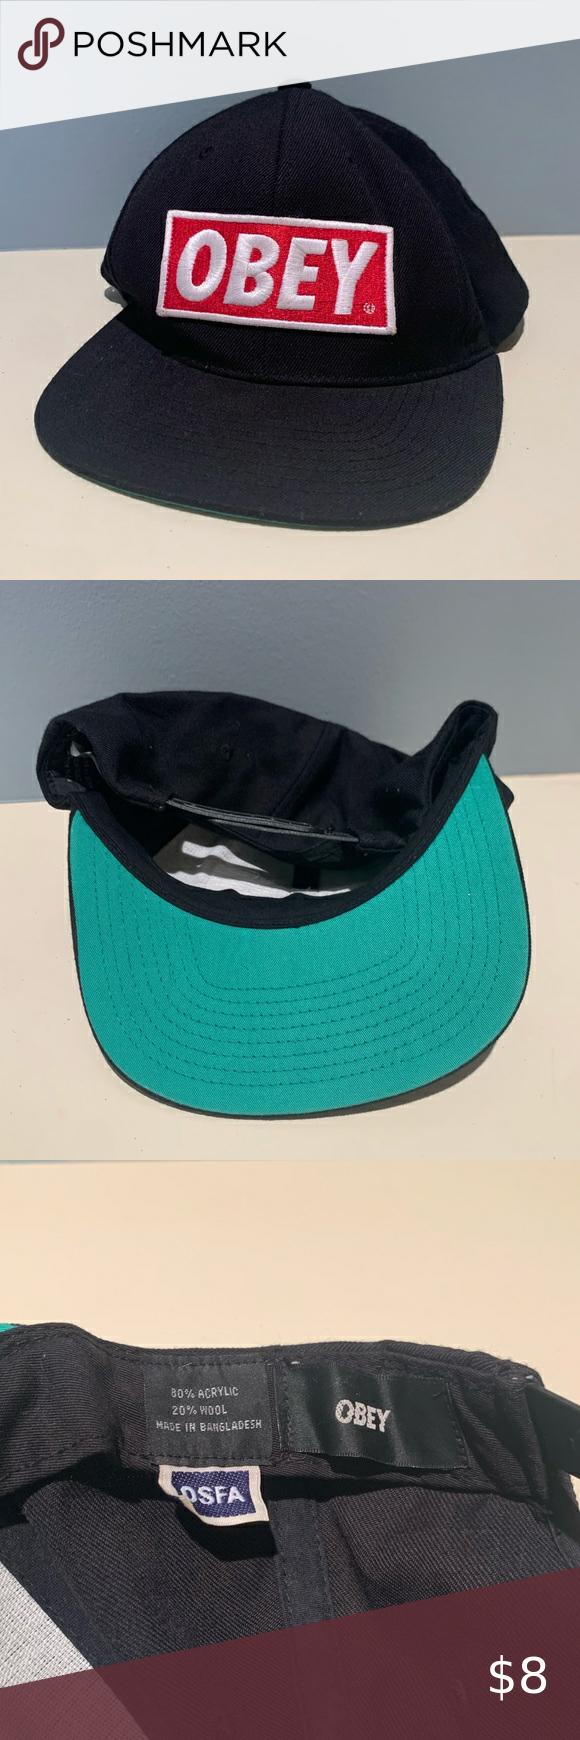 Obey Flat Brimmed Hat Flat Brim Hat Fashion Trends Worn